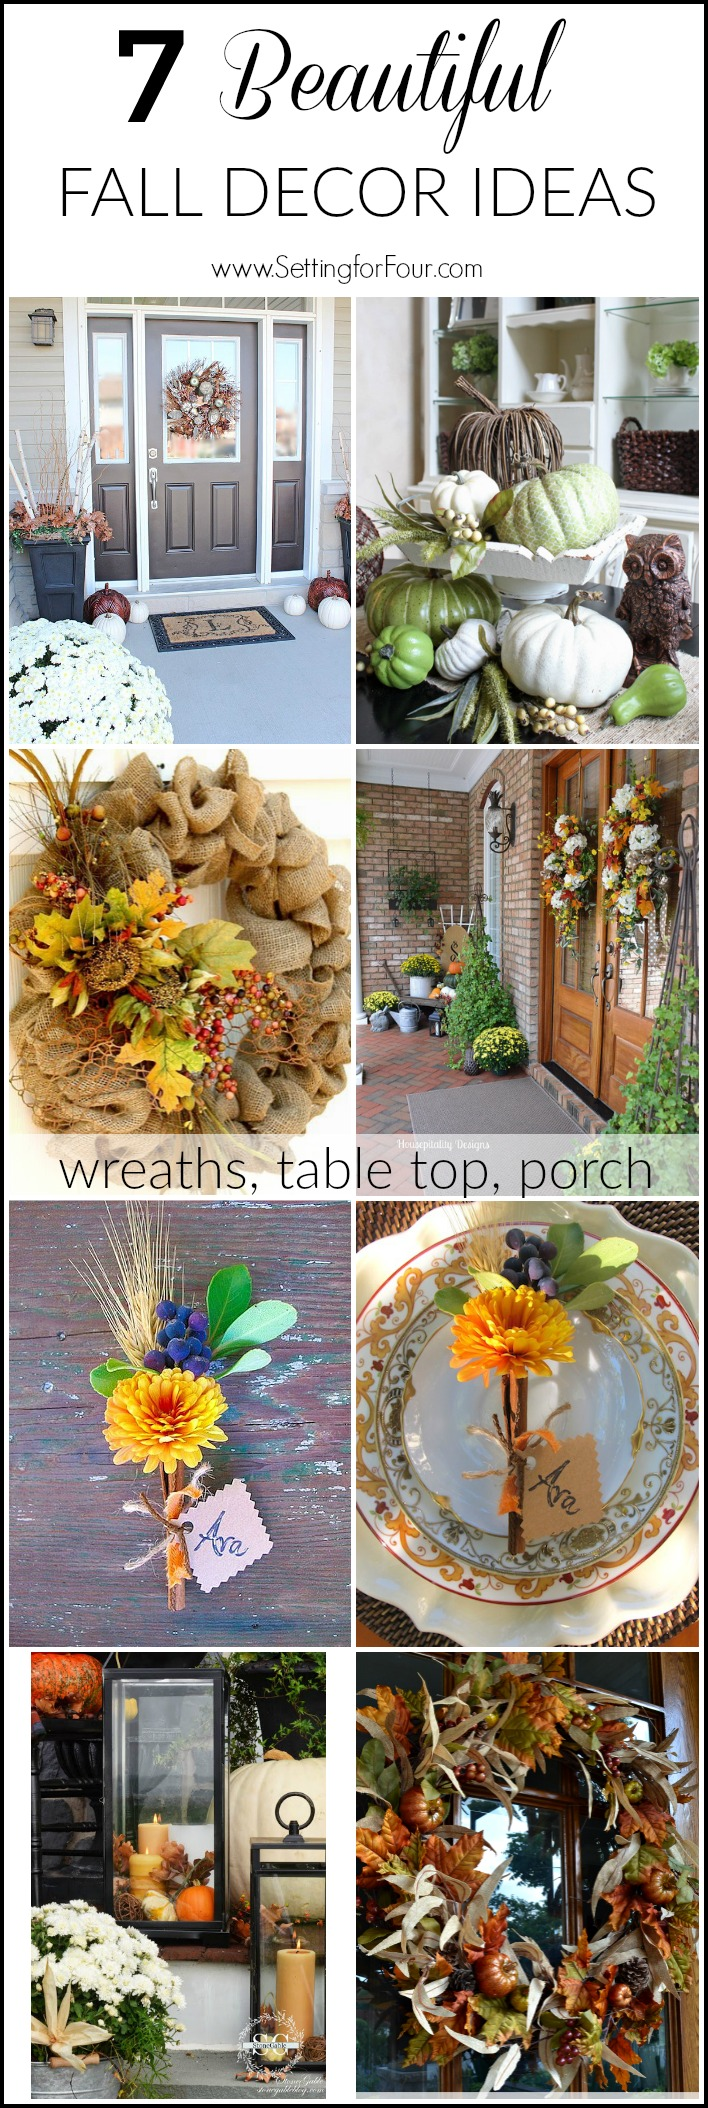 7 beautiful early fall decorating ideas